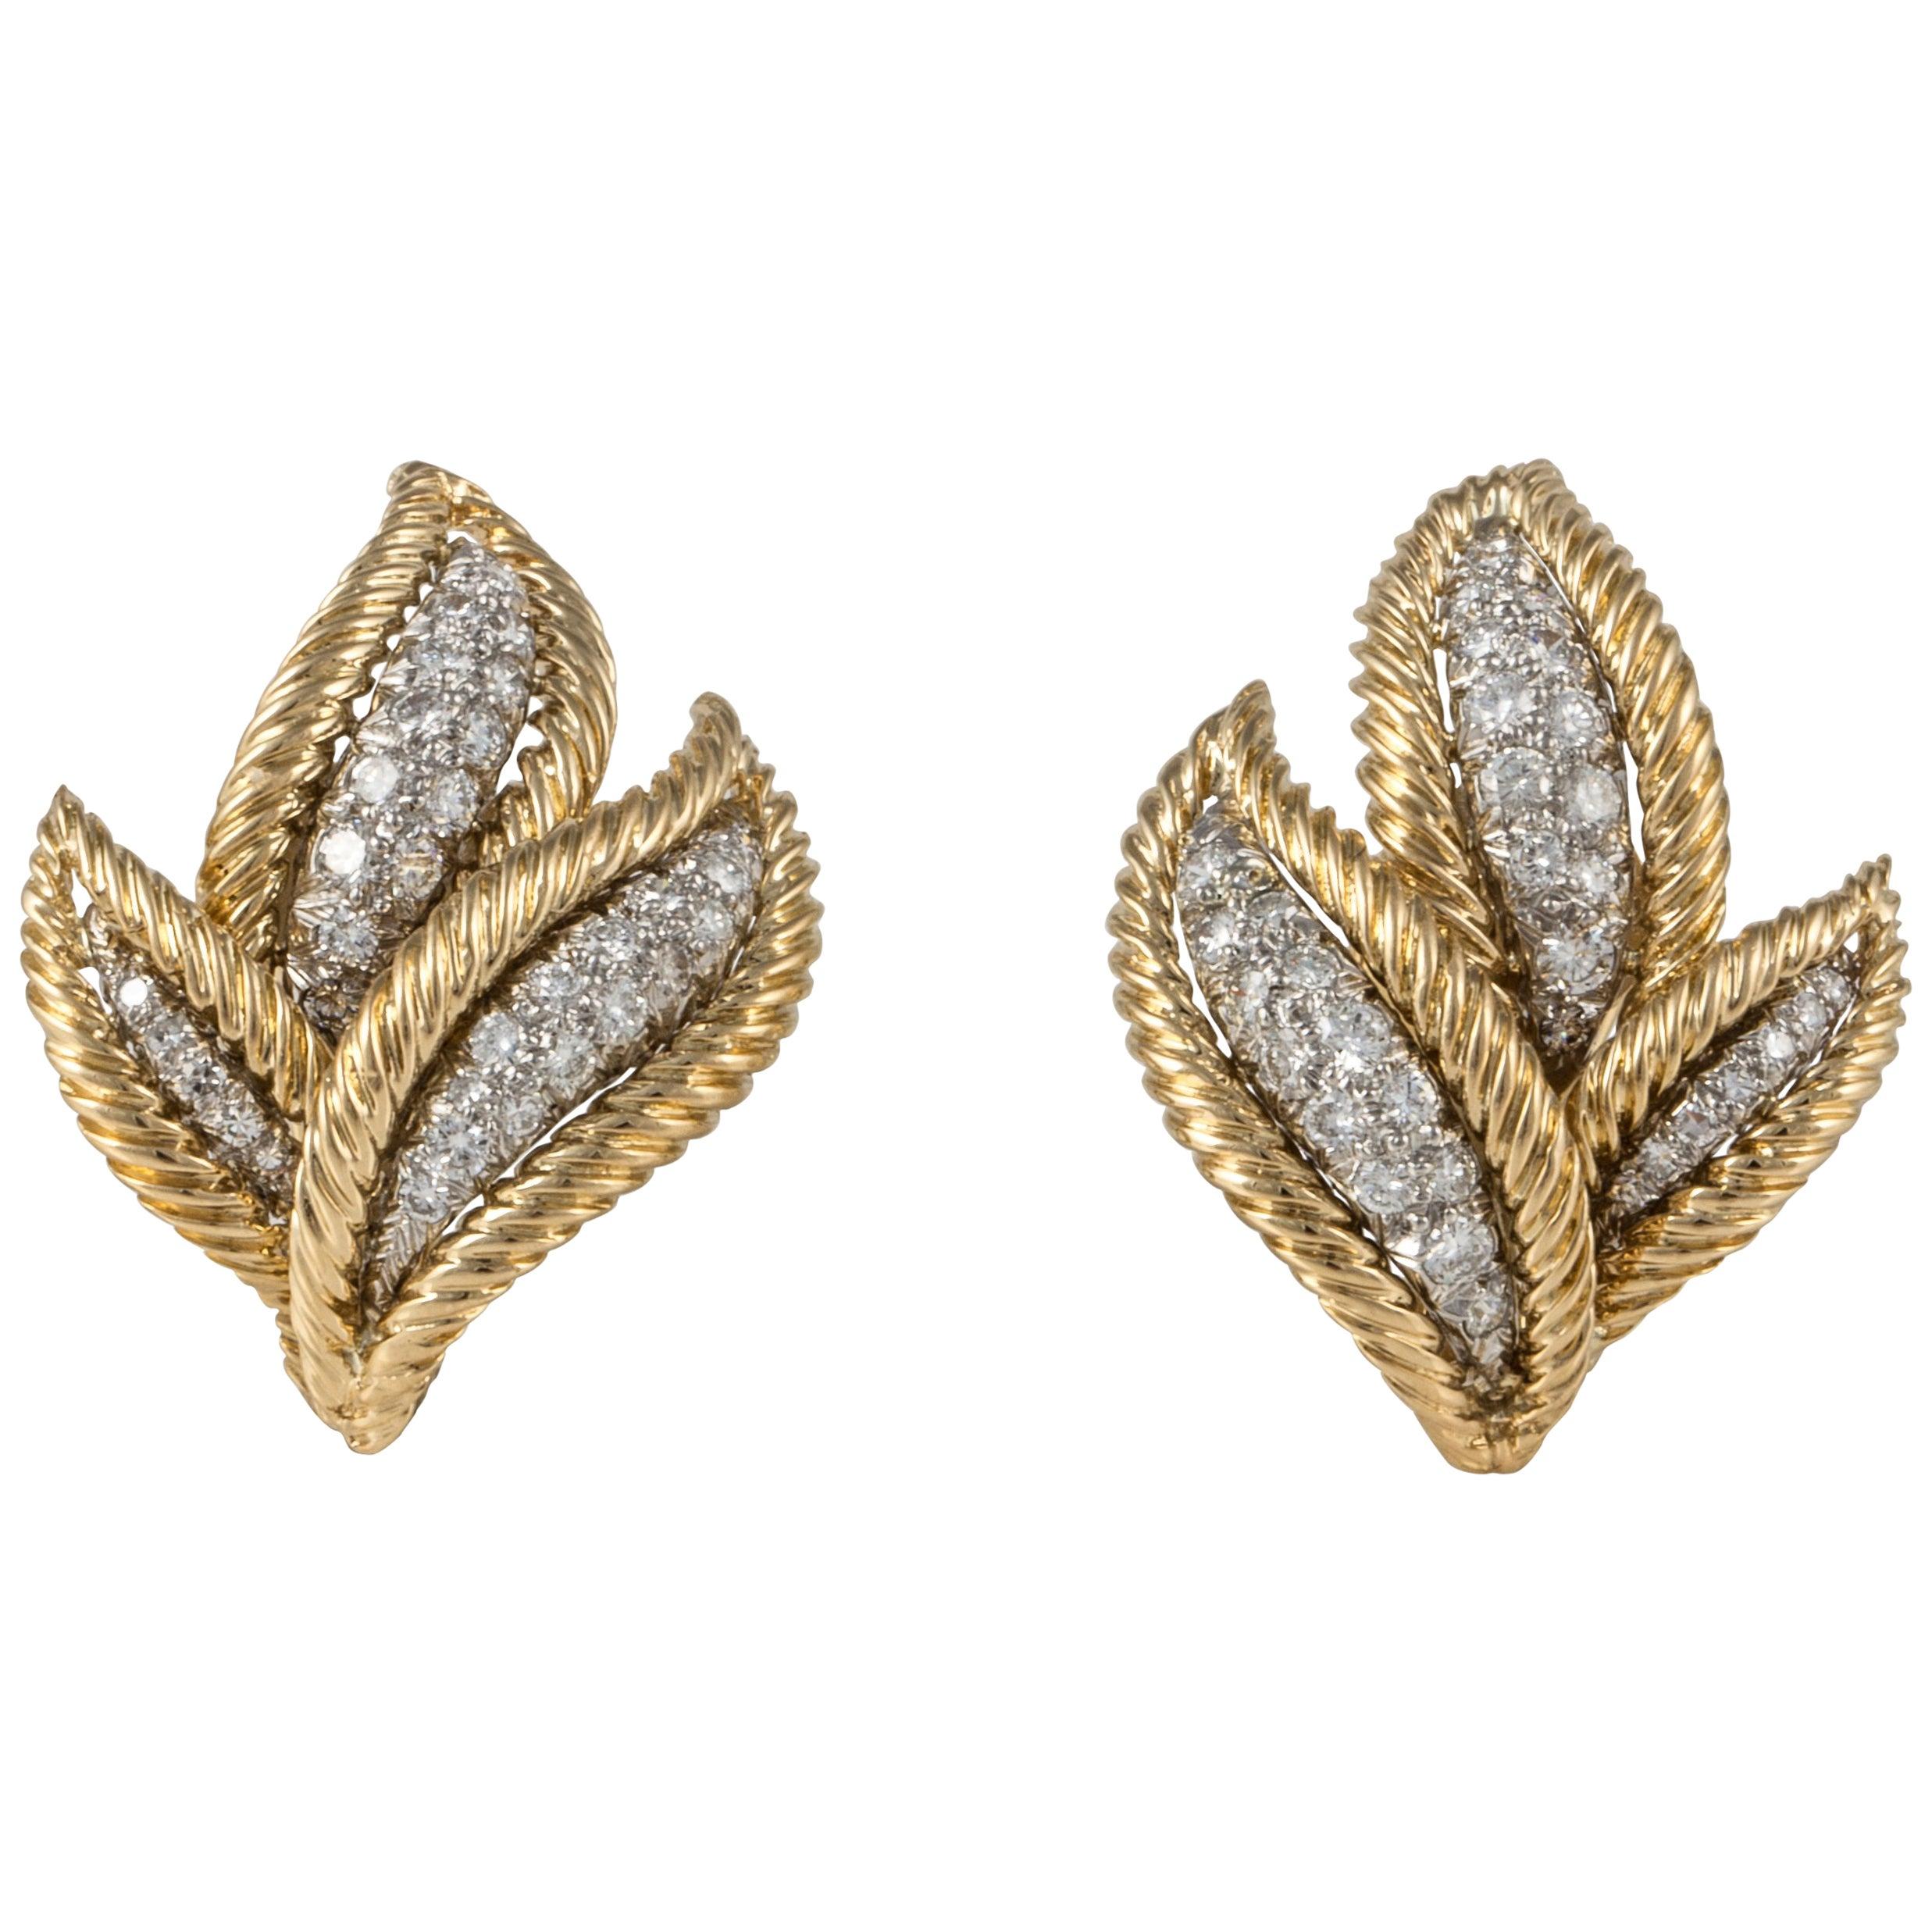 David Webb Diamond Earrings